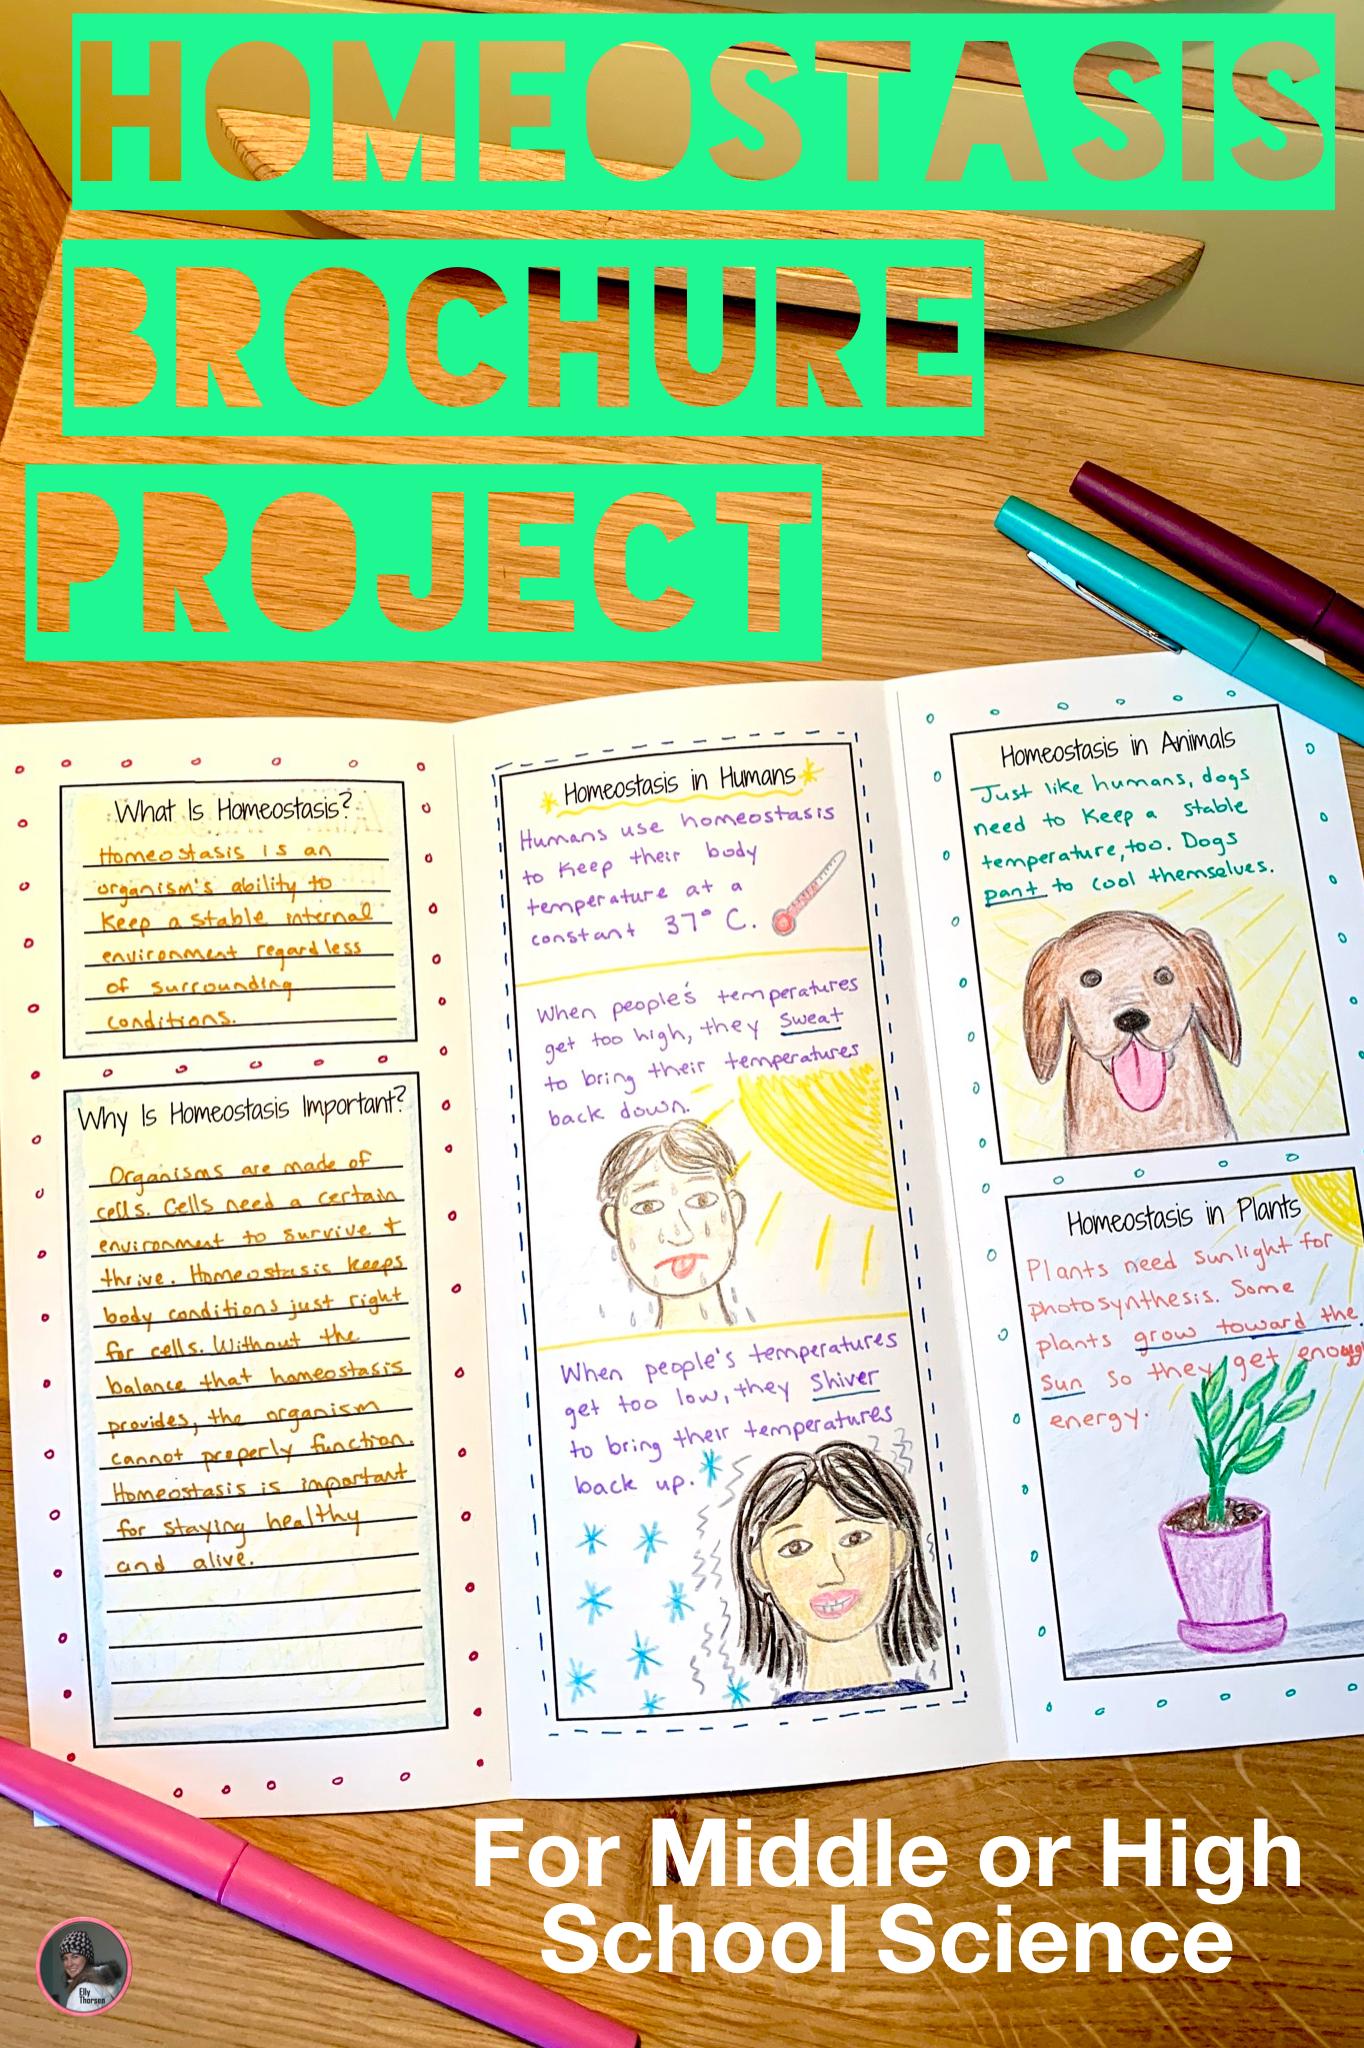 Homeostasis Brochure Project